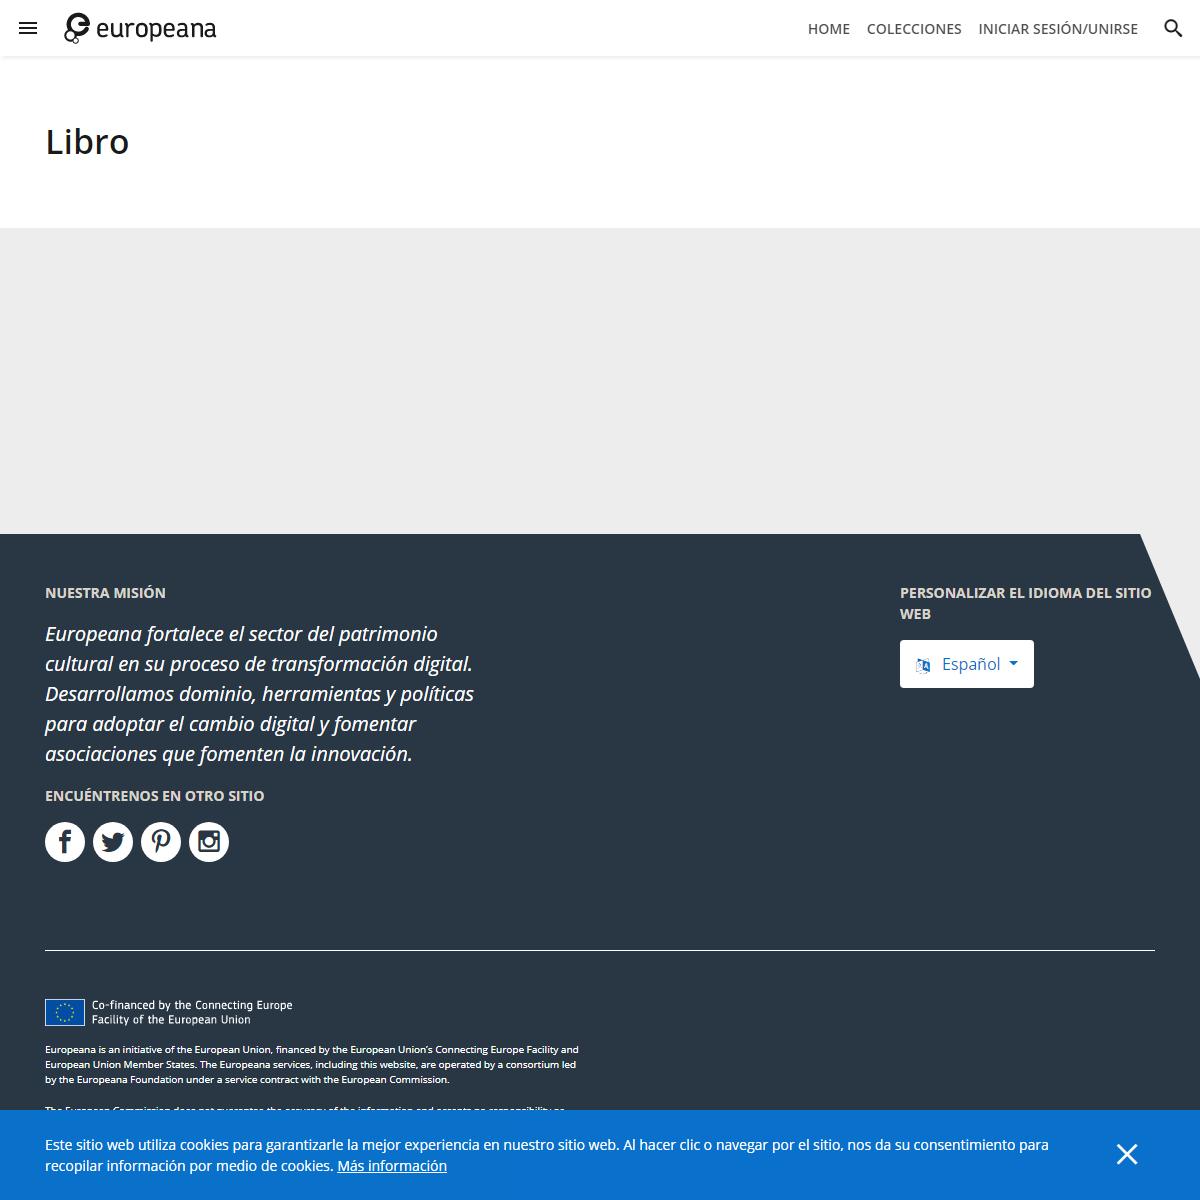 Libro - Europeana